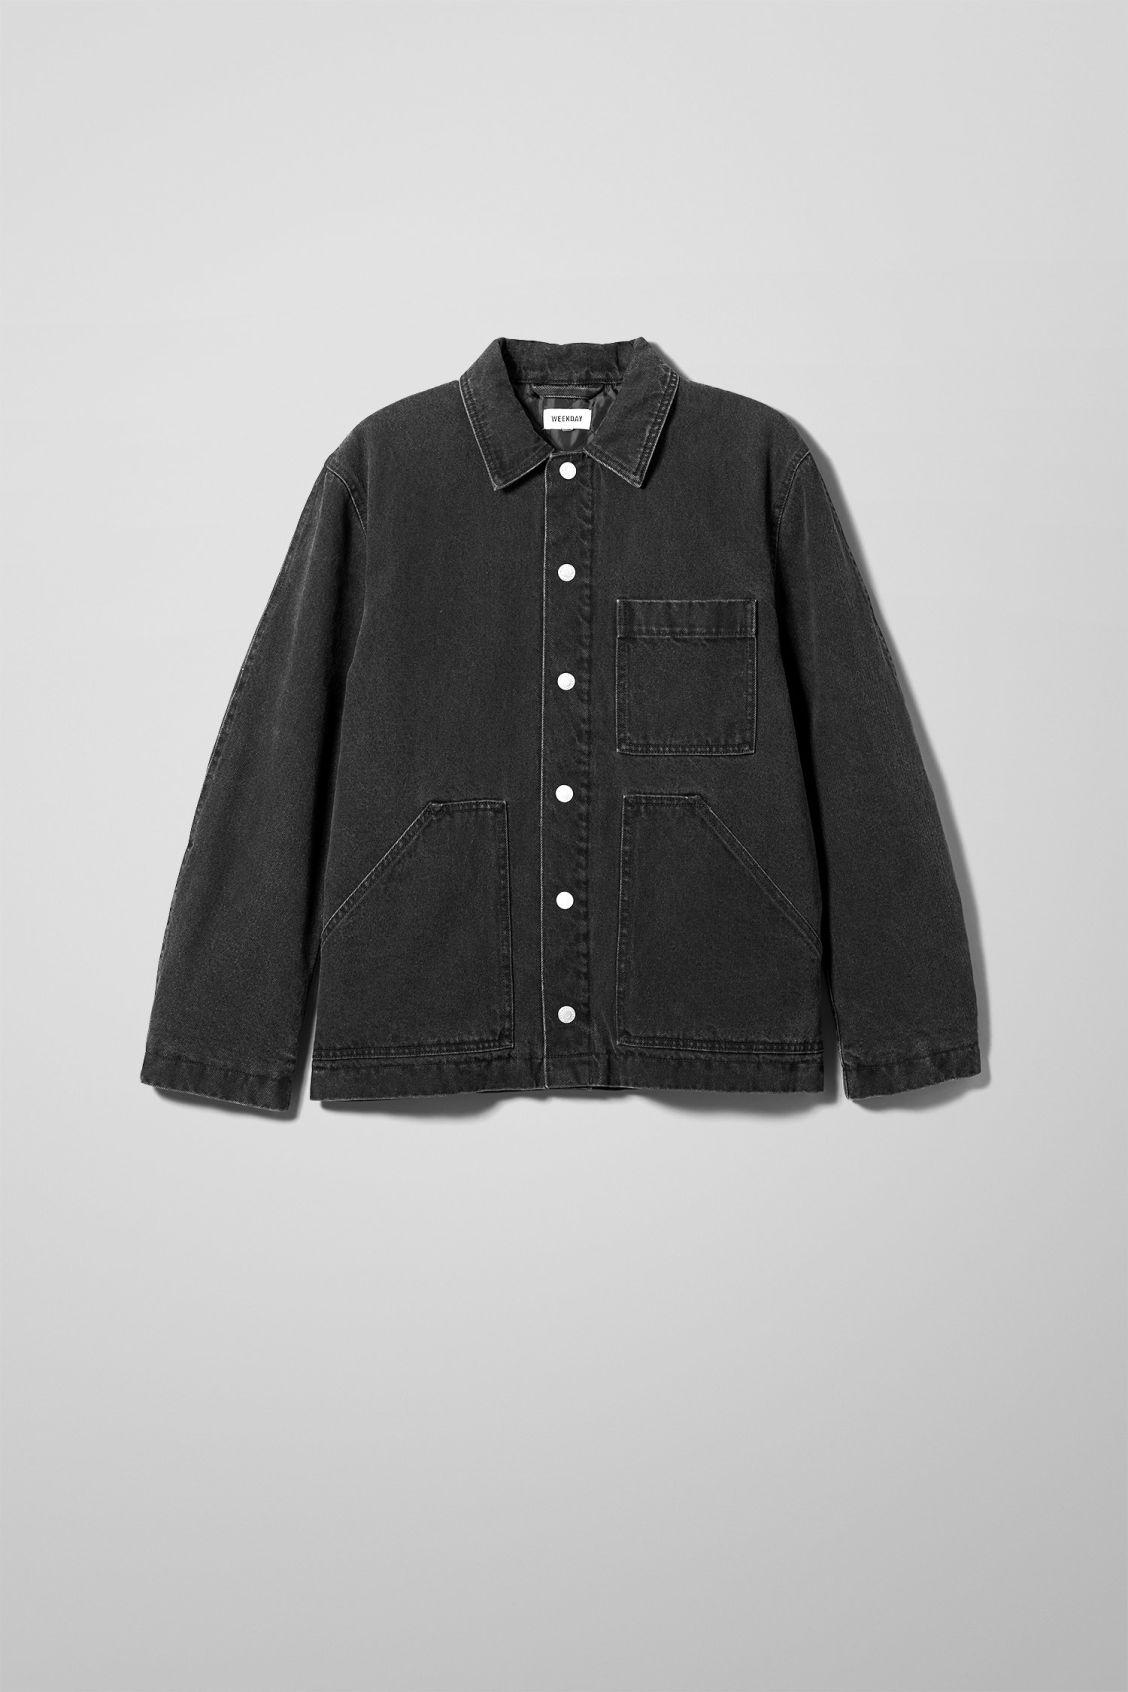 Jess Quilted Jacket Black - Black